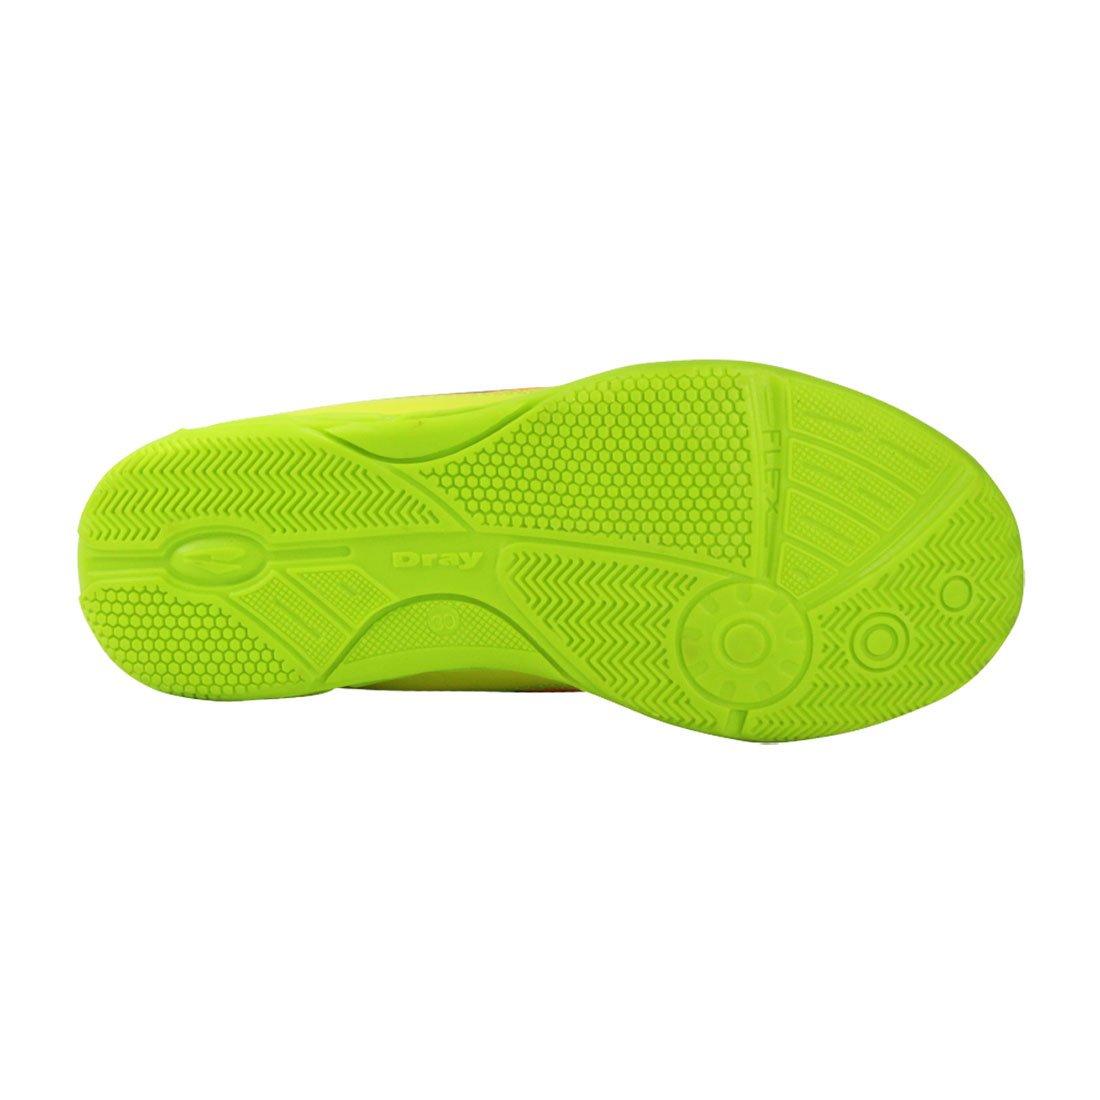 Chuteira Dray Infantil 305 CO - Compre Agora  7e8607e2f4cfc